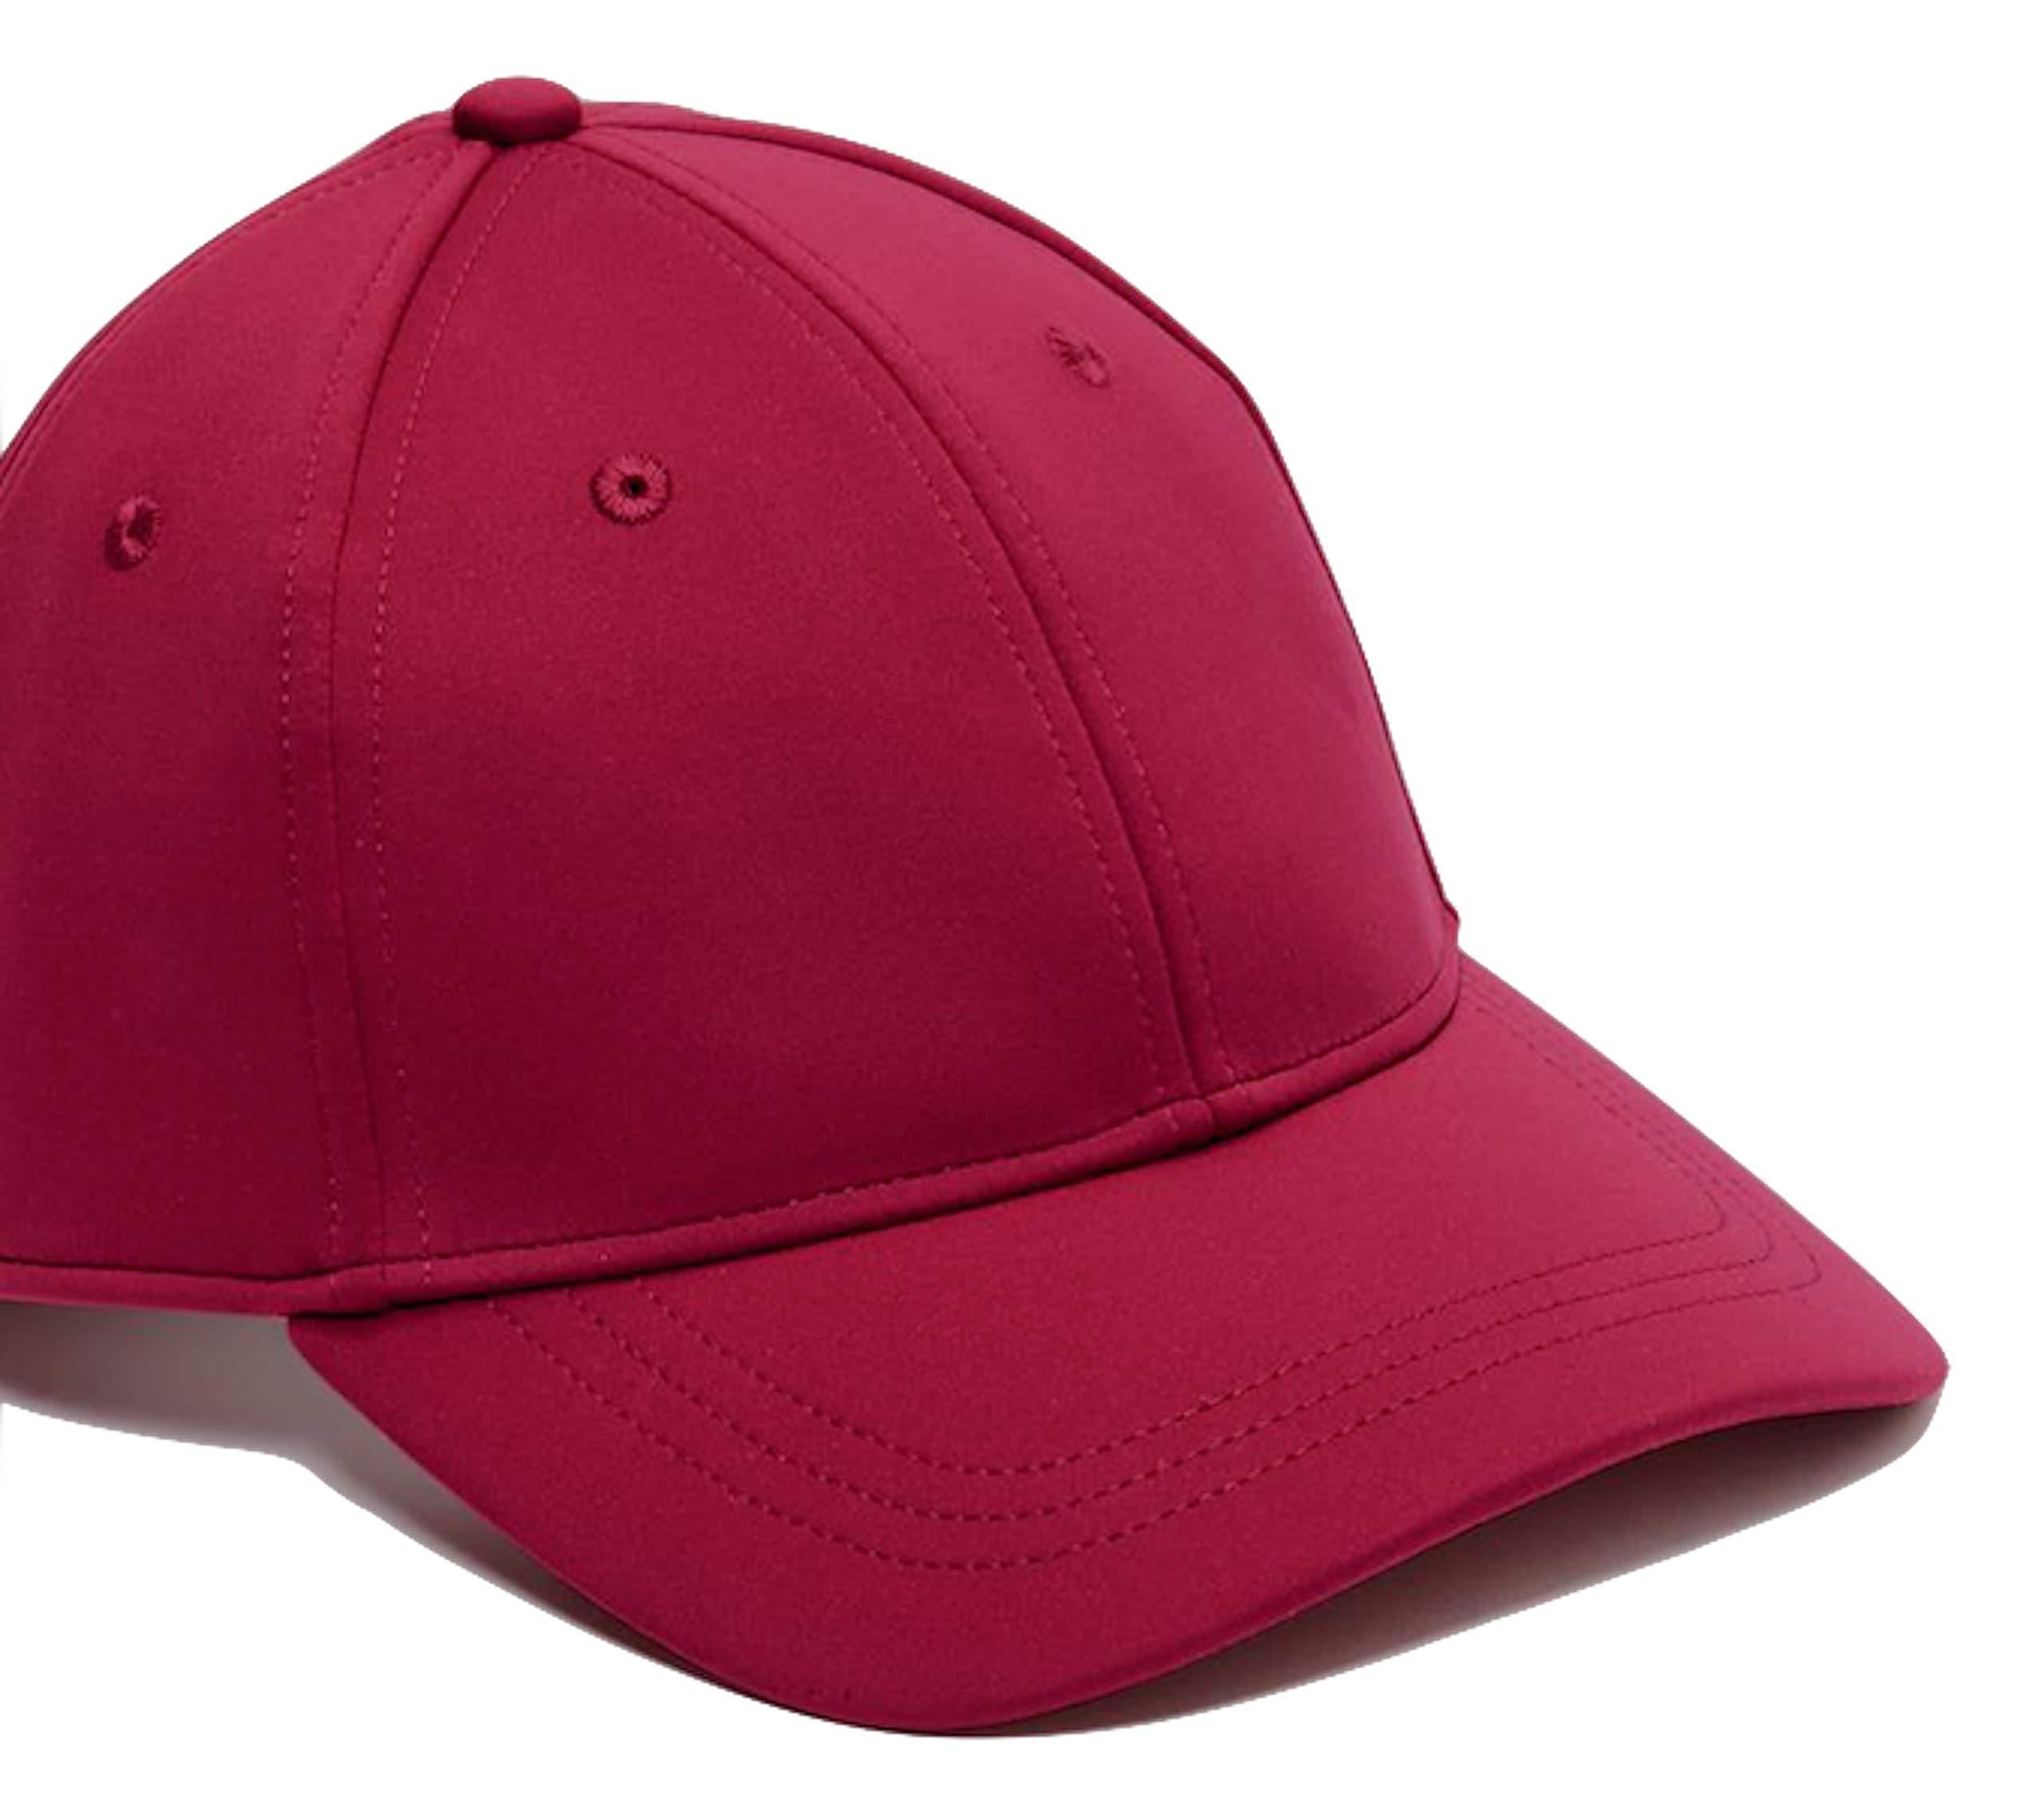 Lululemon Baller HAT - RUBR (Ruby Red)